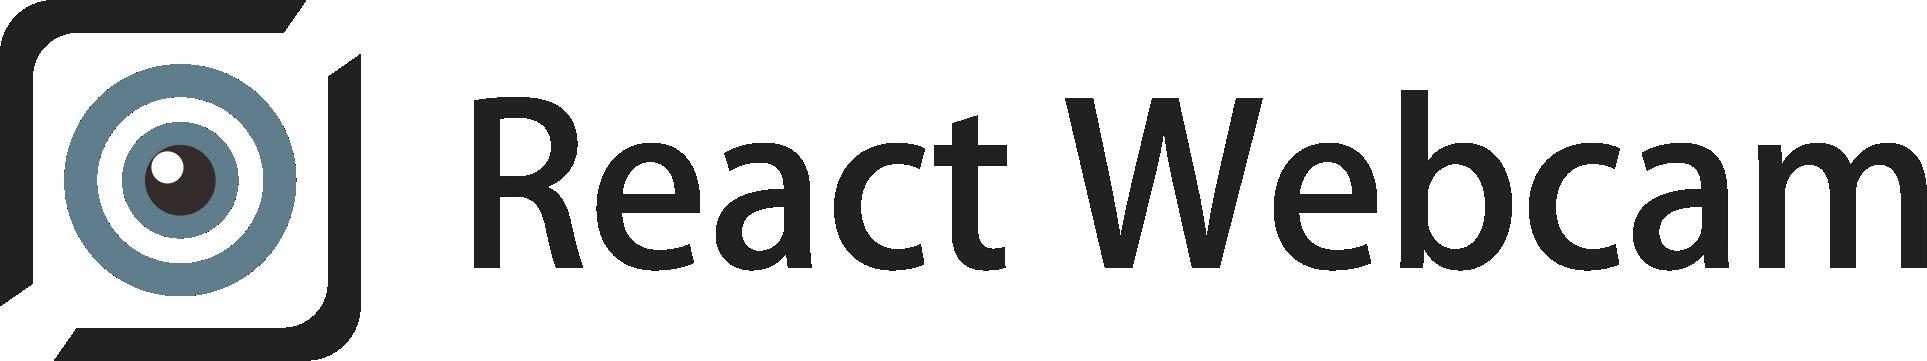 react-webcam - npm